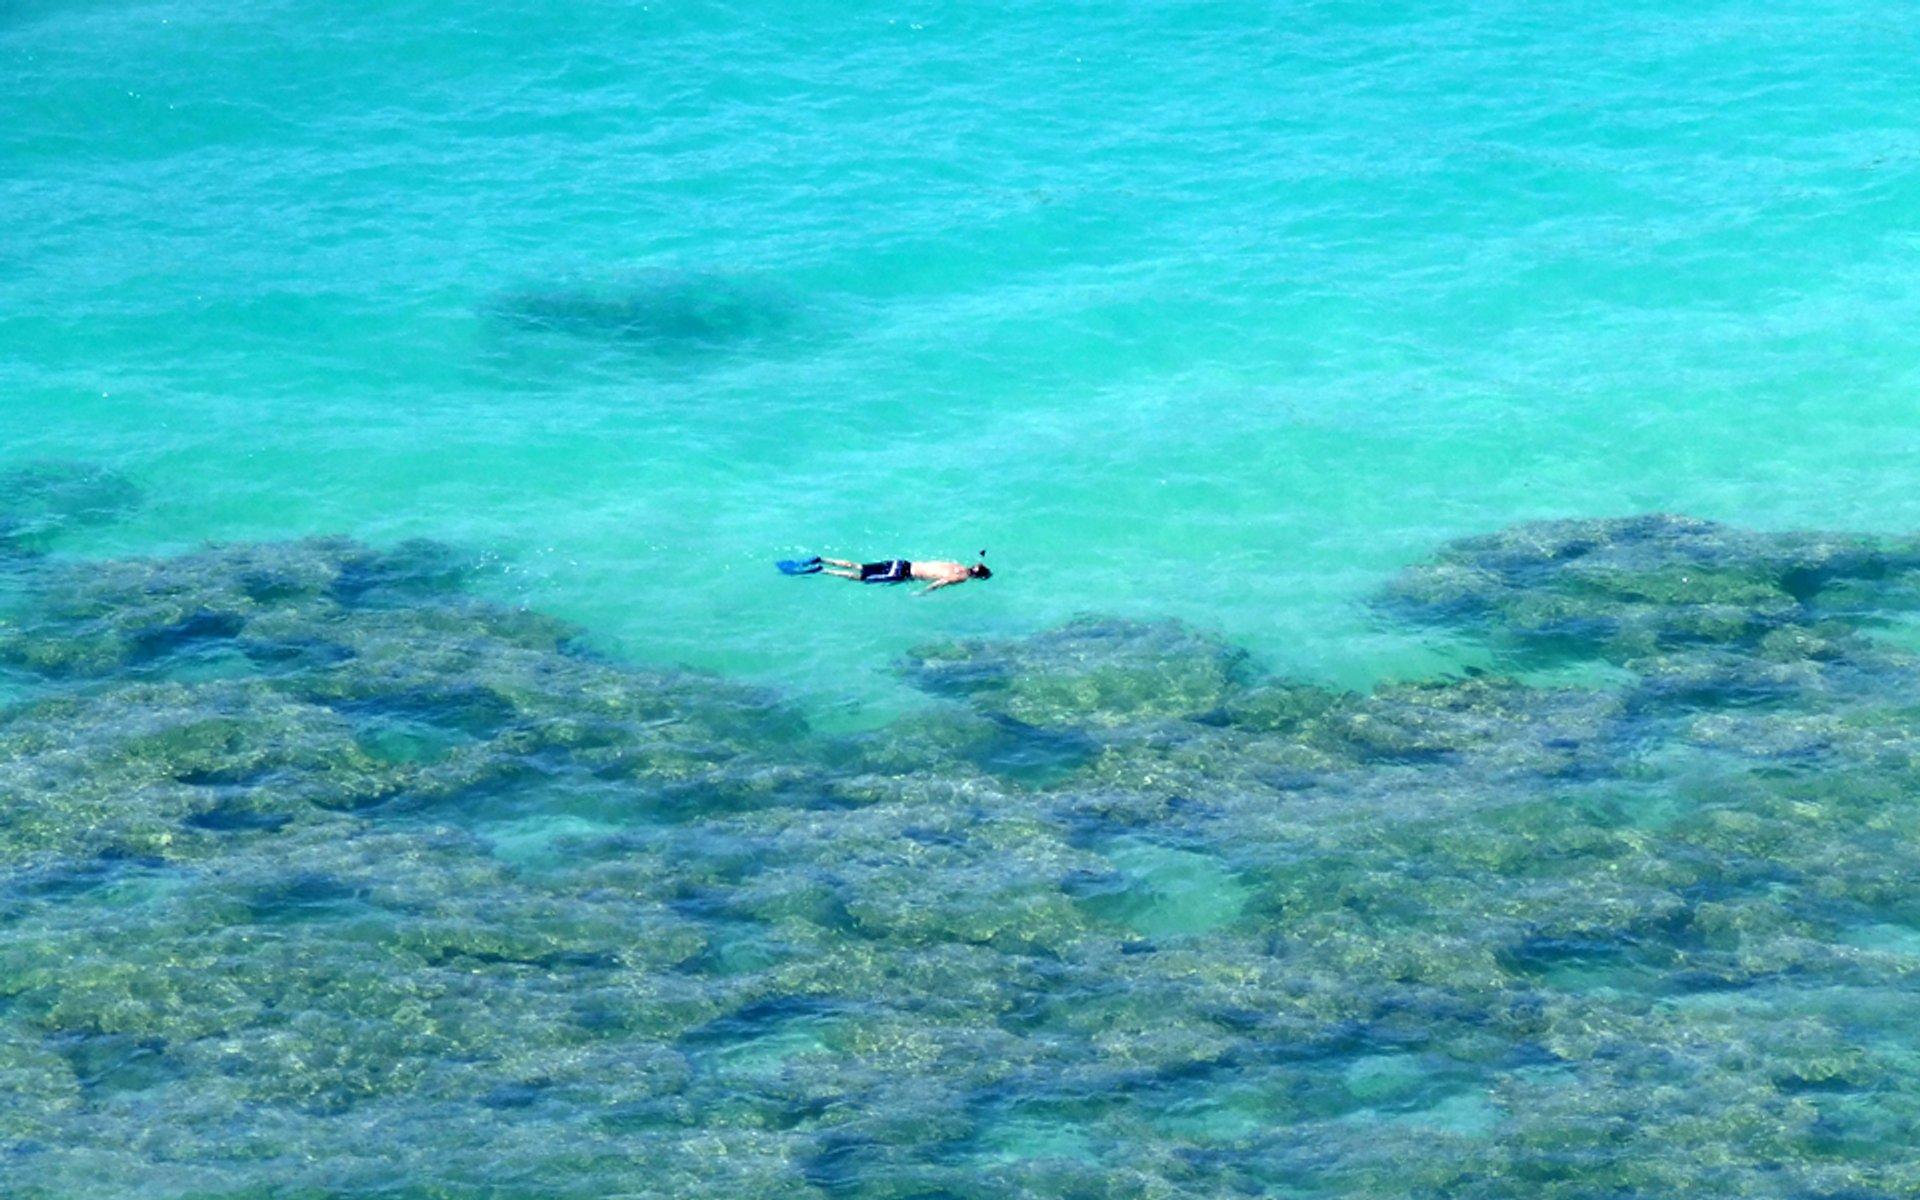 Snorkeling in Hawaii 2019 - Best Time